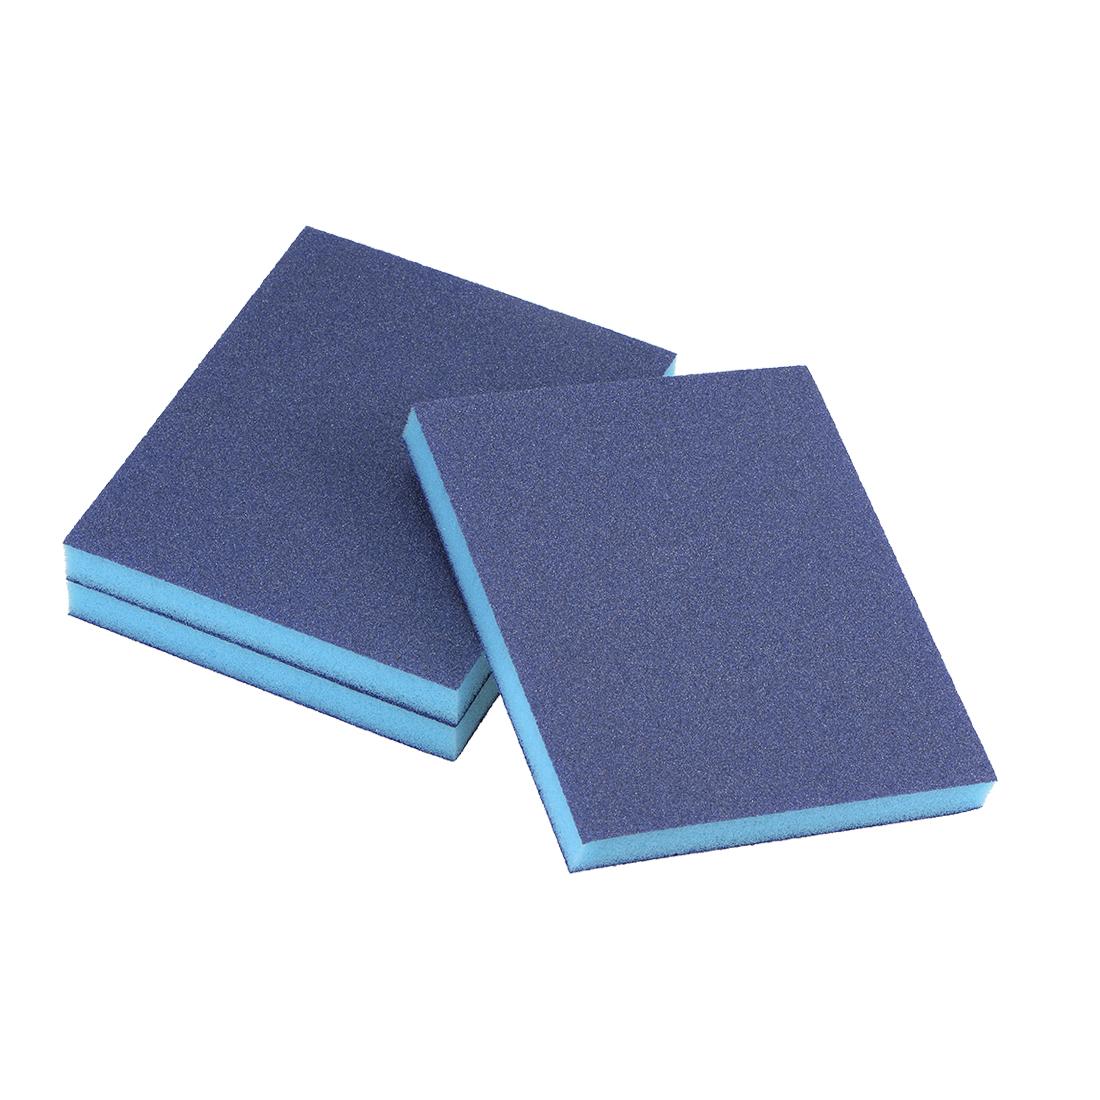 Sanding Sponge 120 Grit Sanding Block Pad Blue 3pcs